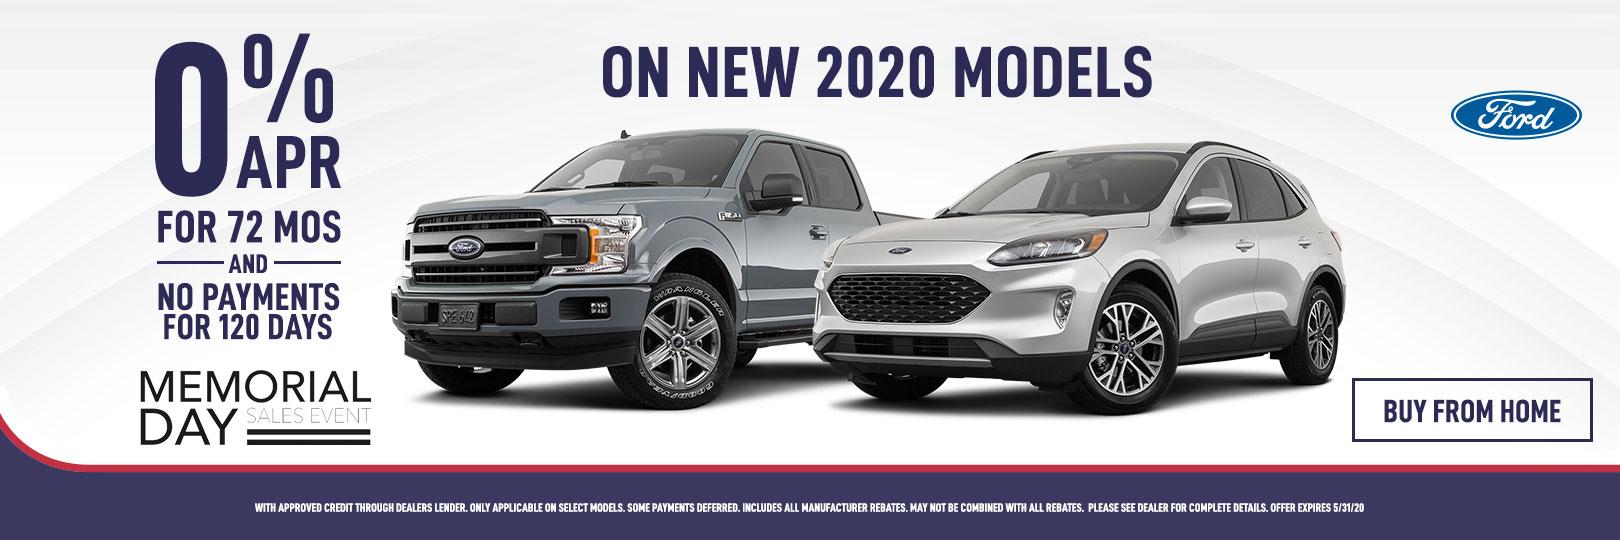 0% APR on 2020 Ford Models